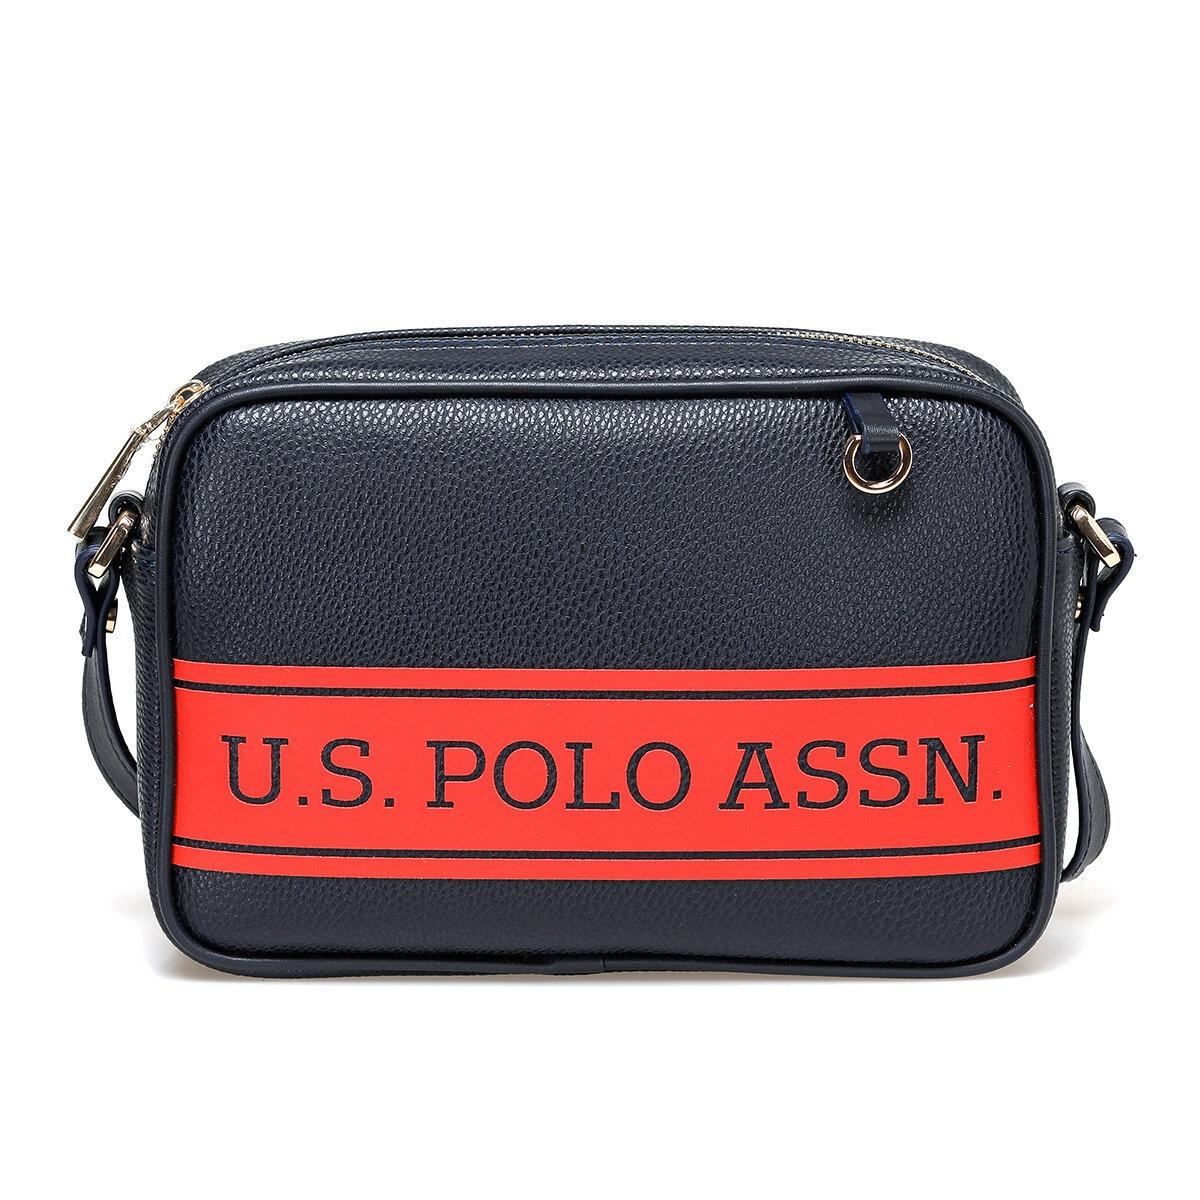 FLO US20266 White Women Messenger Bag U.S. POLO ASSN.